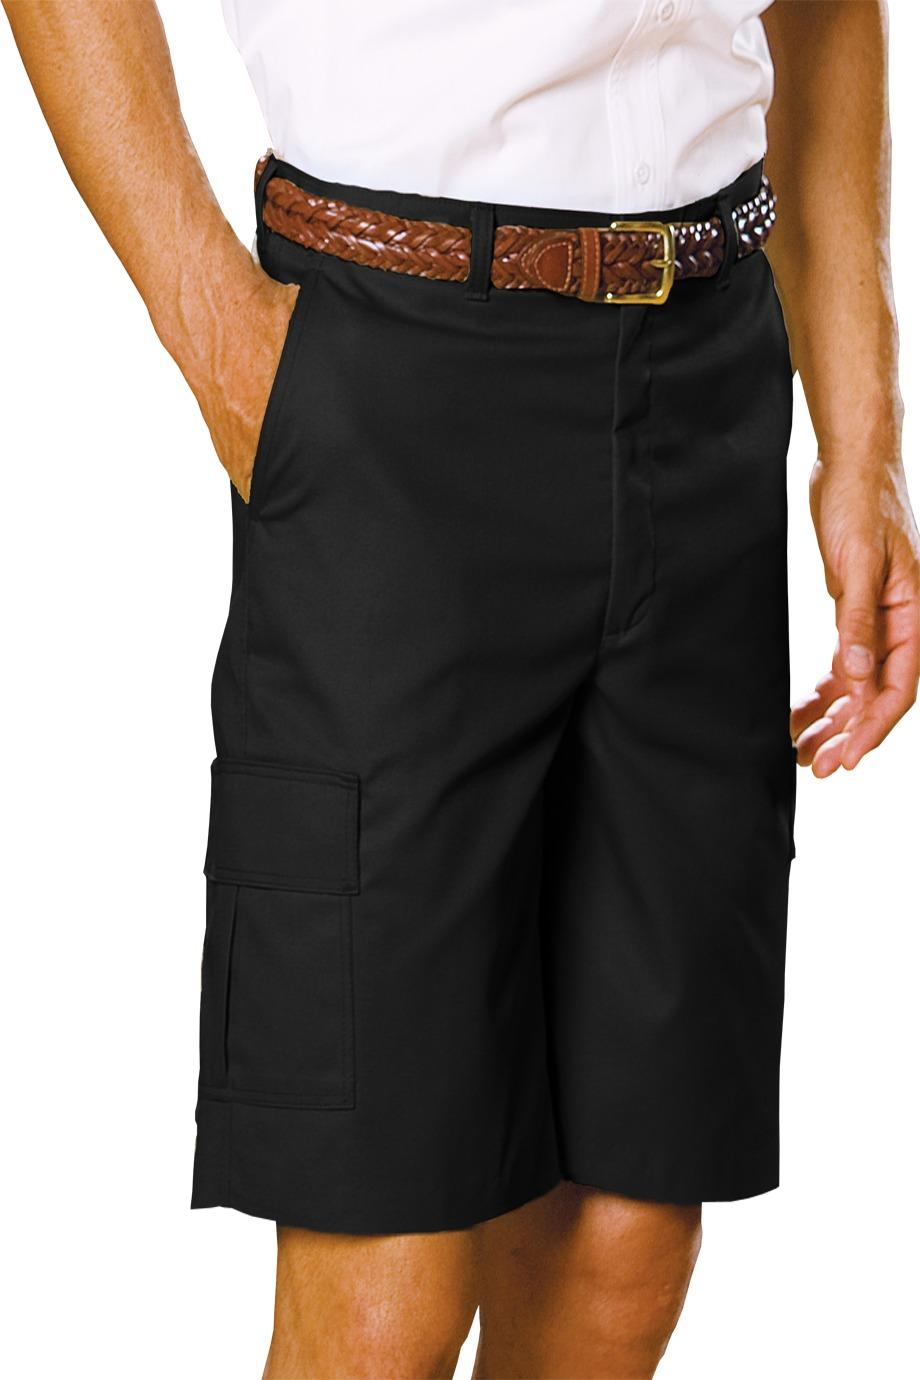 Edwards Garment 2485 - Men's Cargo Short